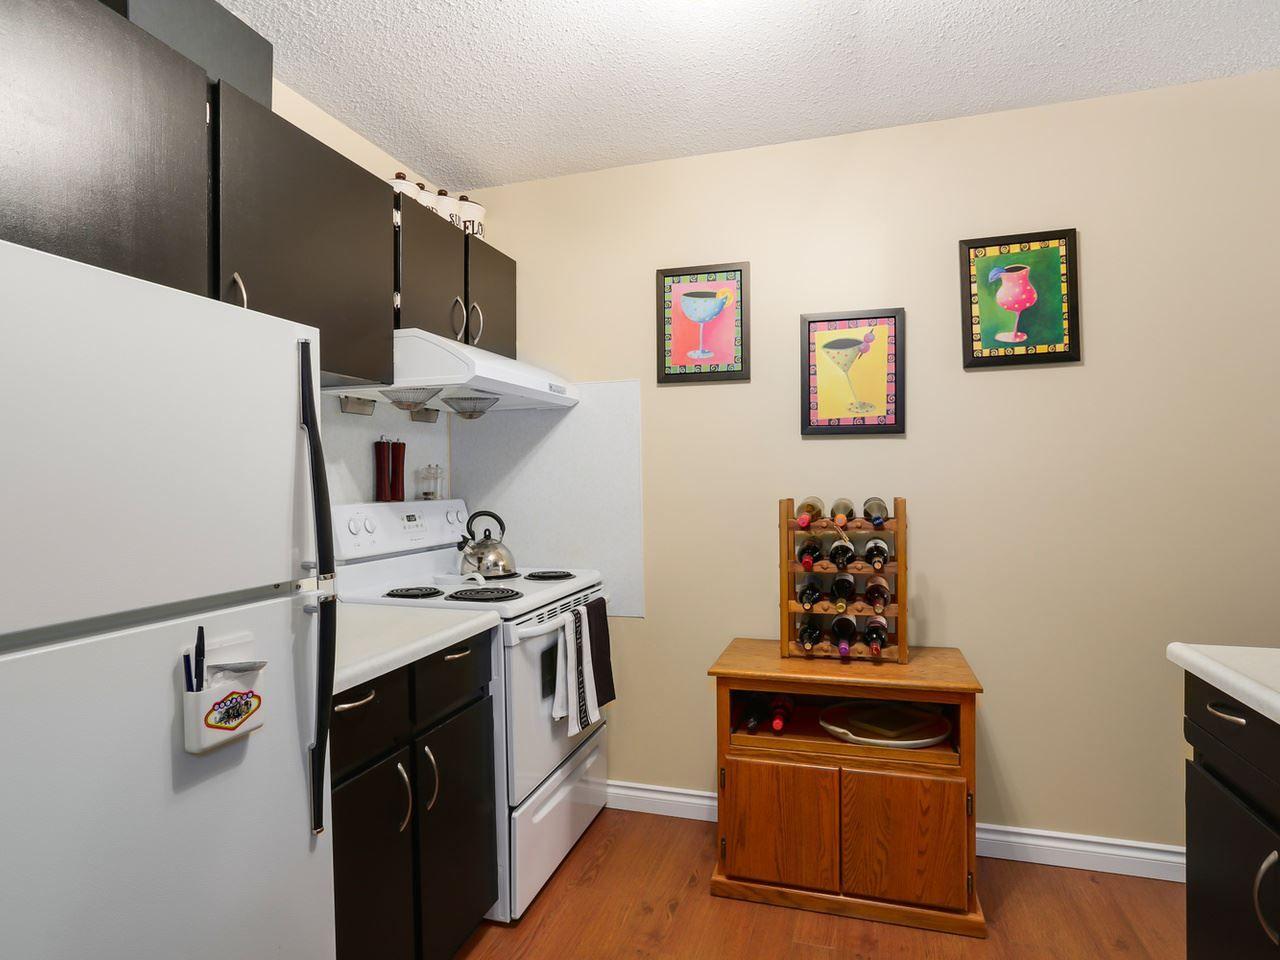 "Photo 7: Photos: 278C 8635 120 Street in Delta: Annieville Condo for sale in ""Delta Cedars"" (N. Delta)  : MLS®# R2037207"